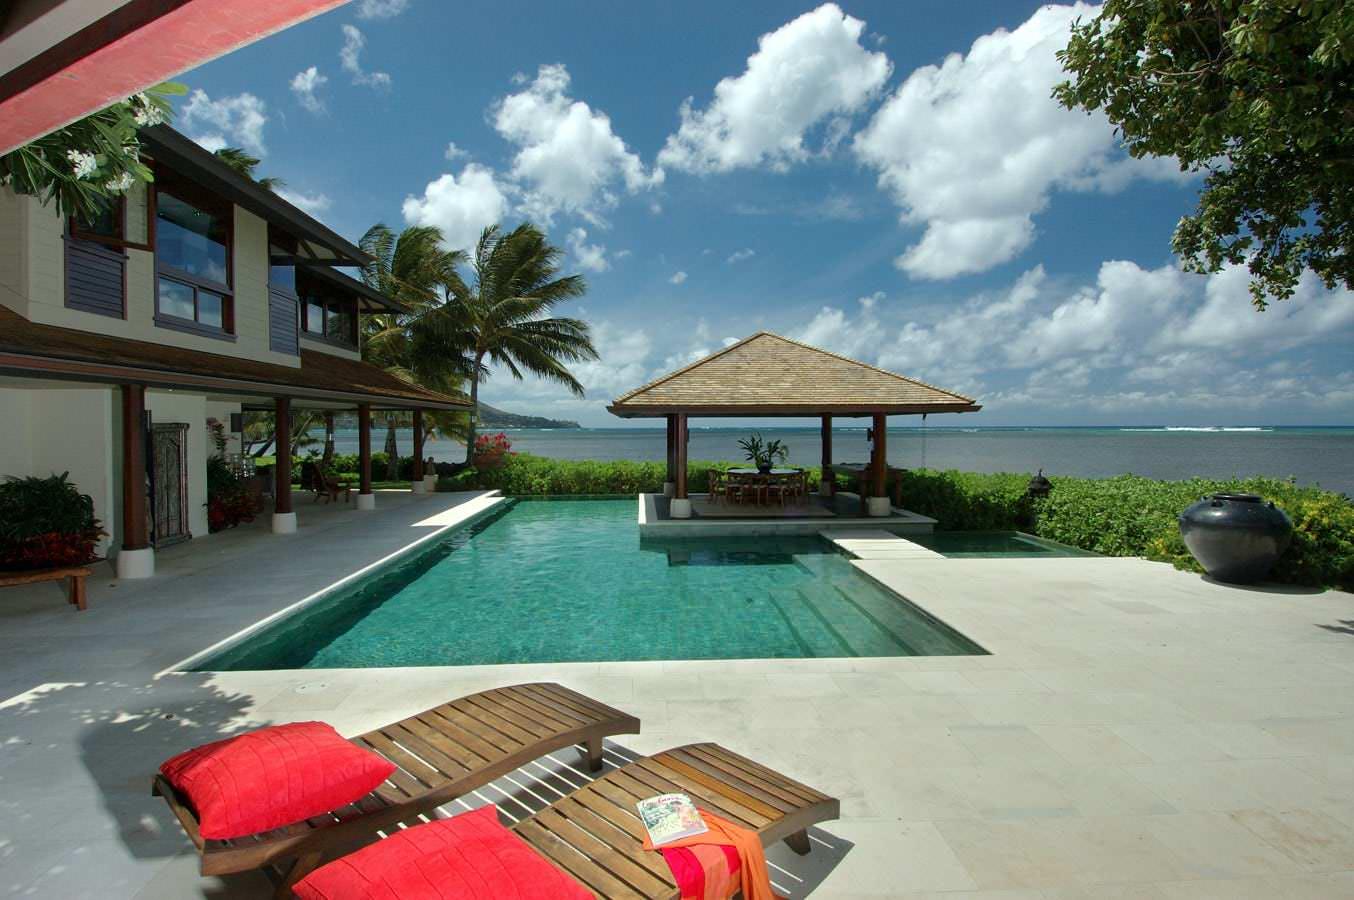 Bay-shore Balinese Estate